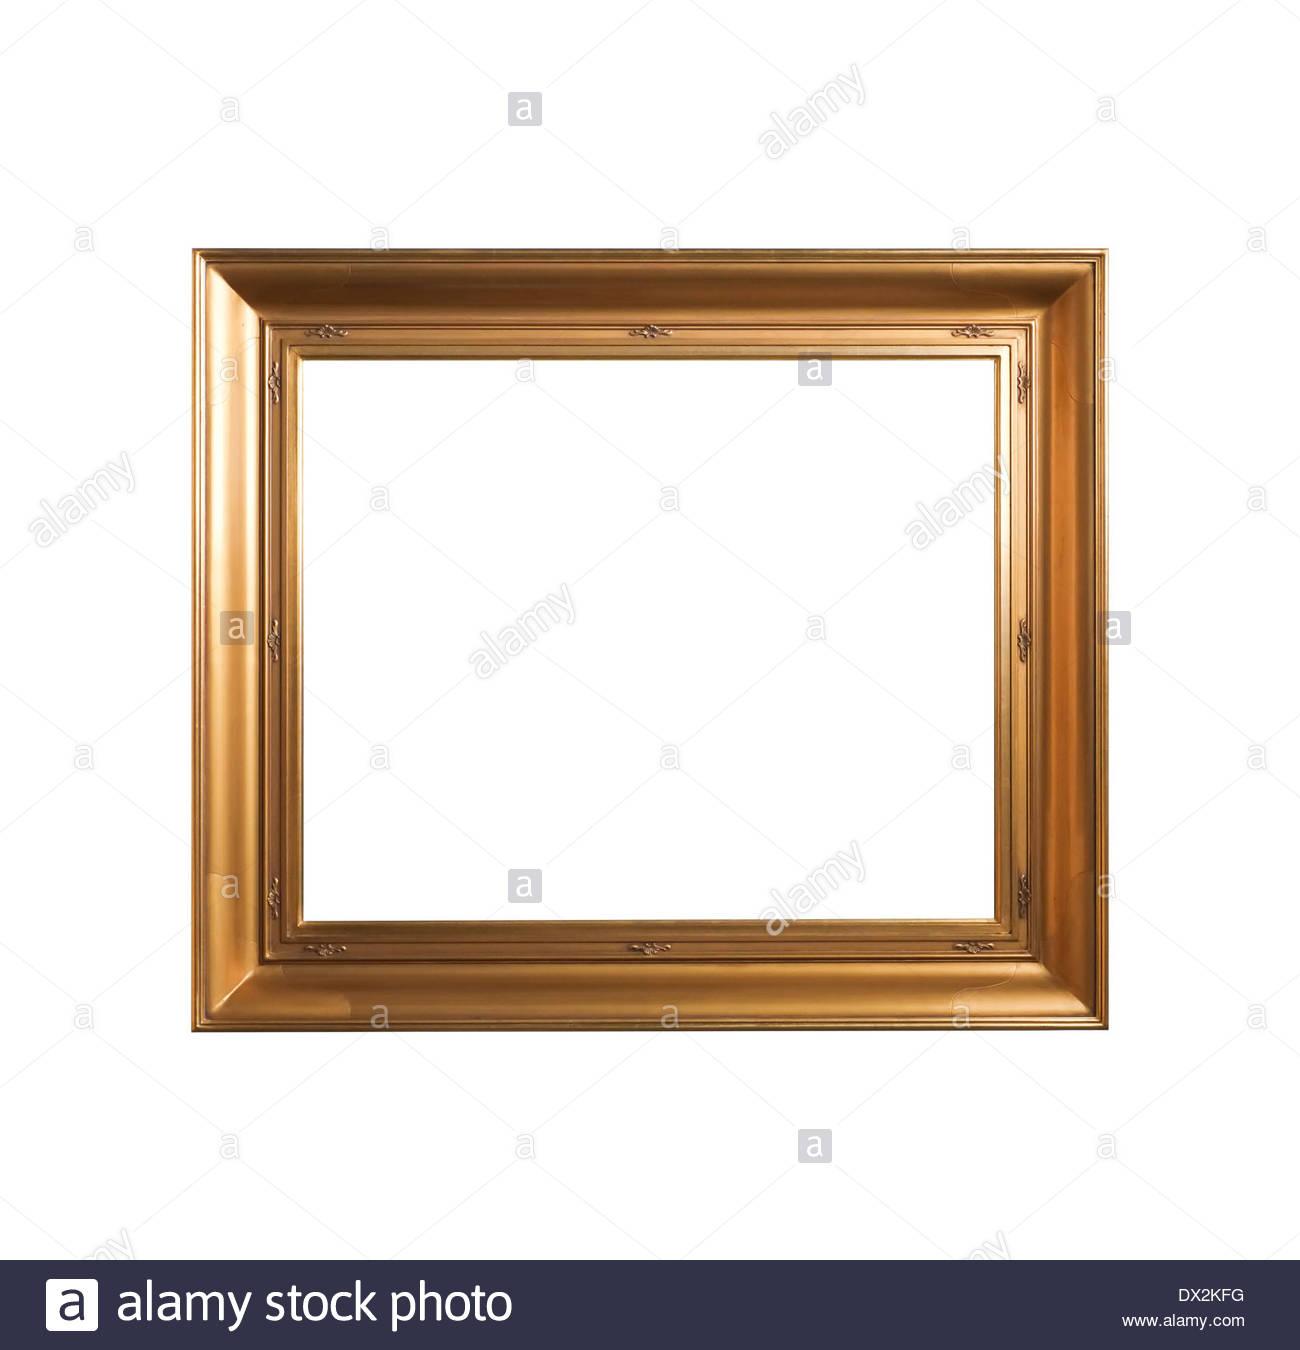 golden vintage frame isolated on white background - Stock Image